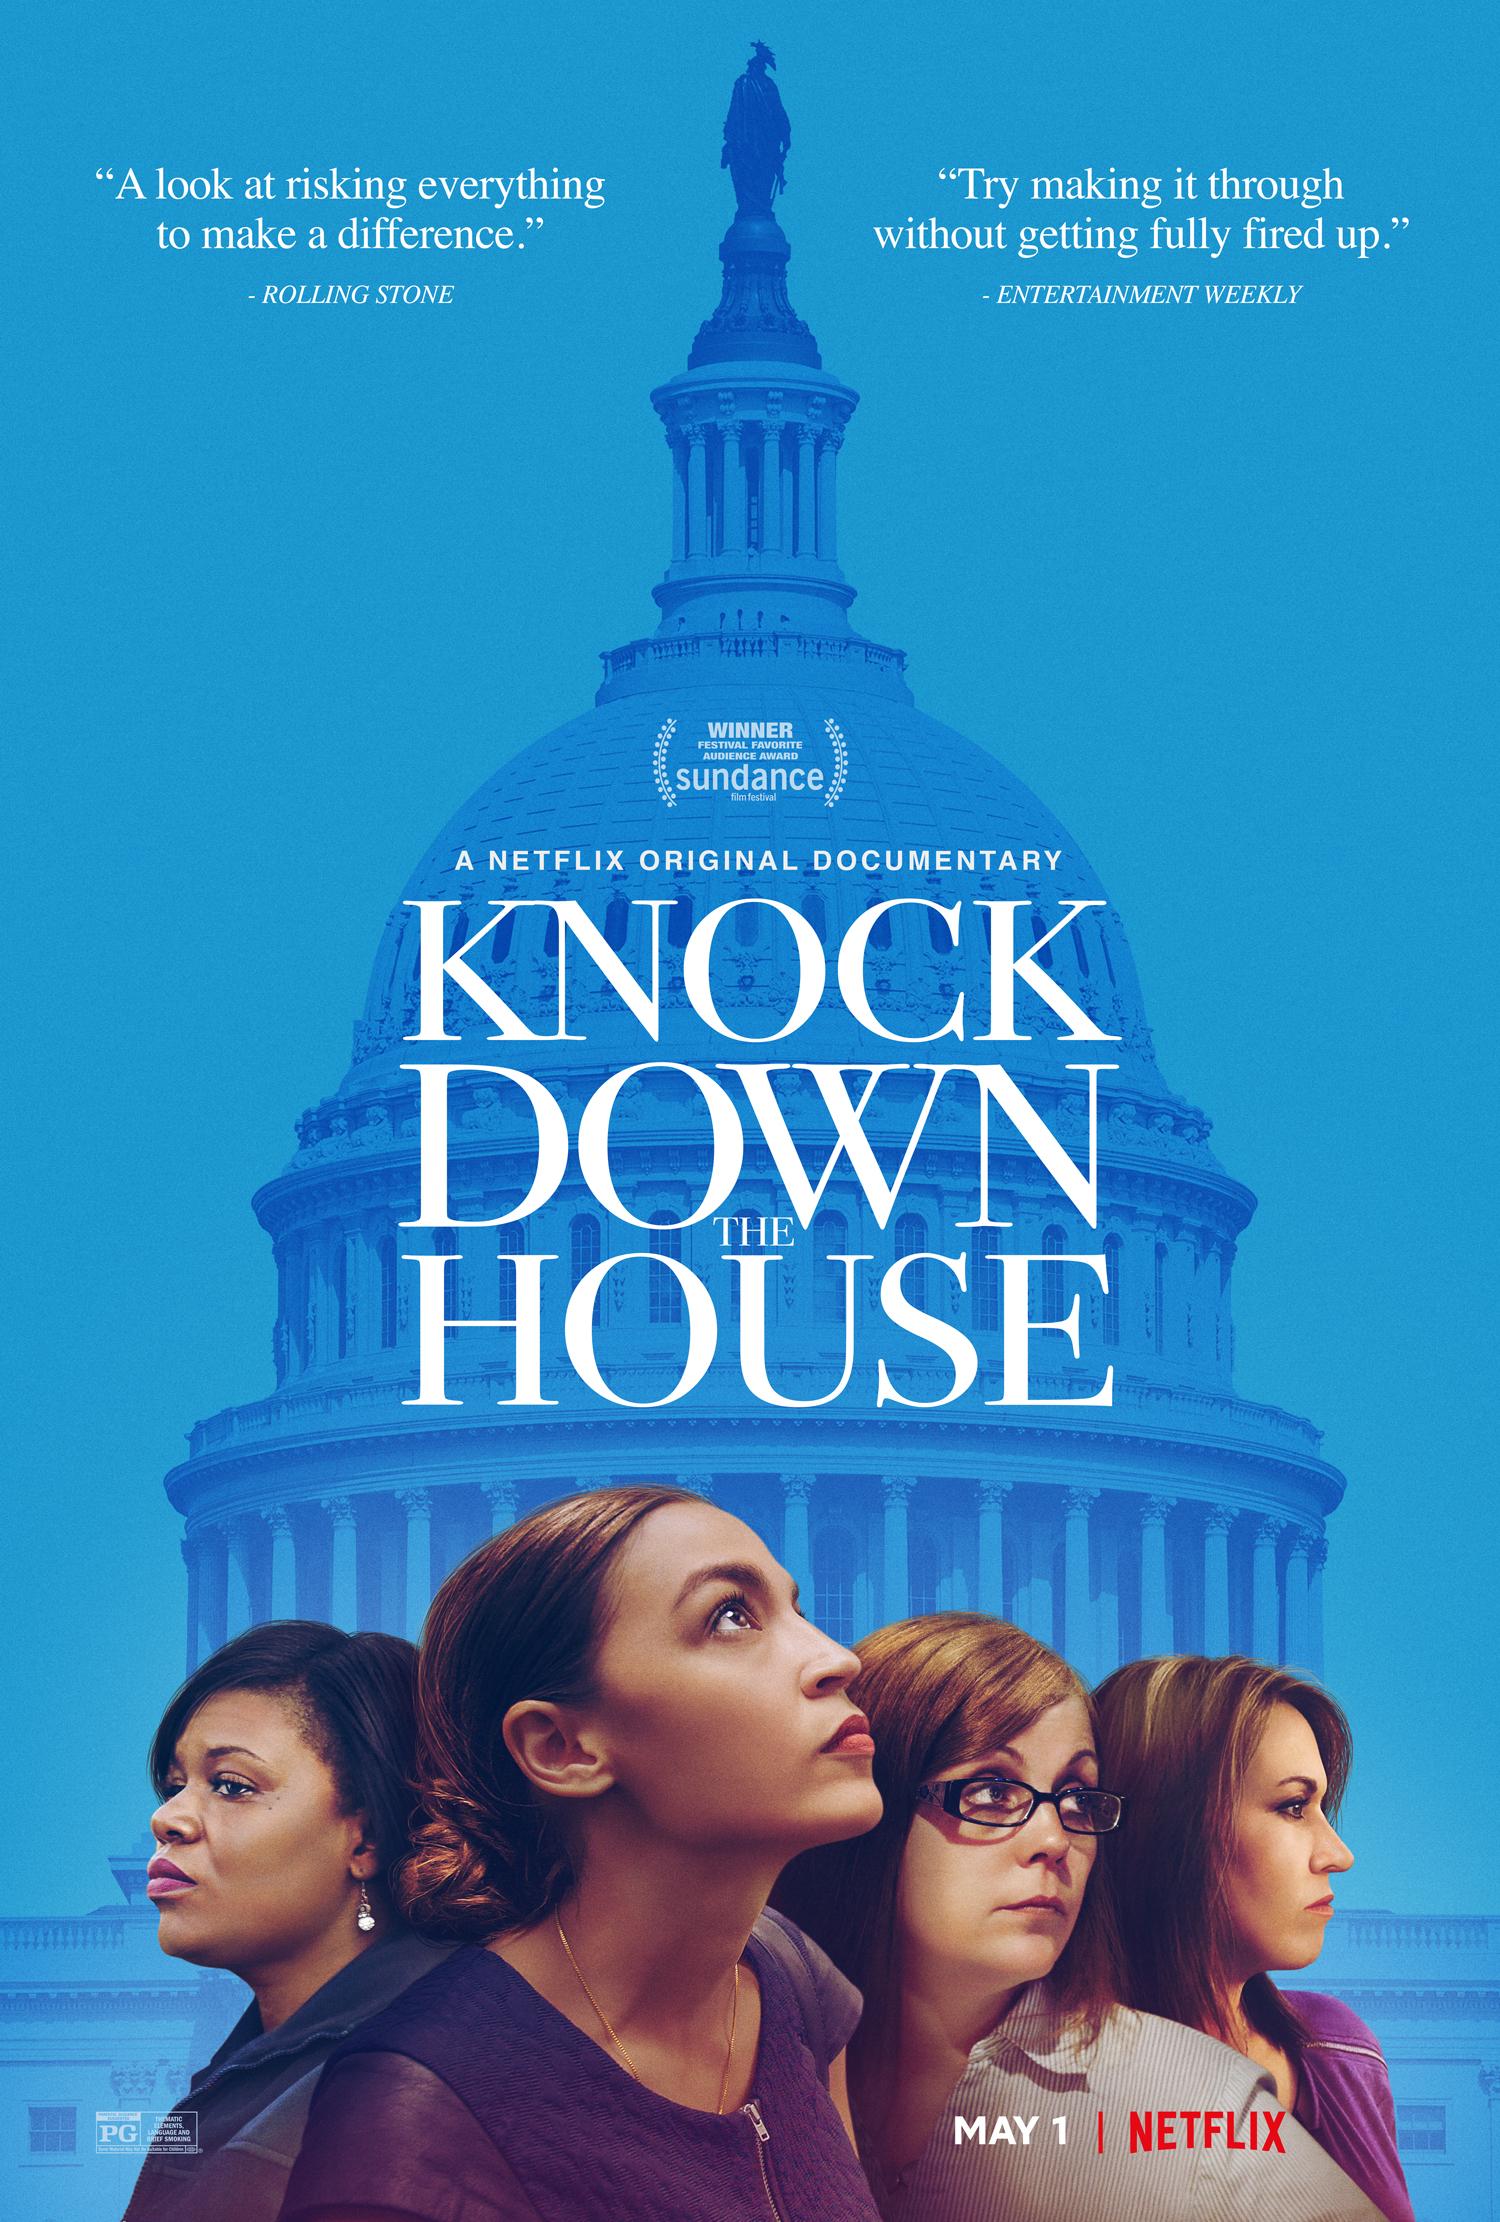 Knock Down the House (2019) - IMDb